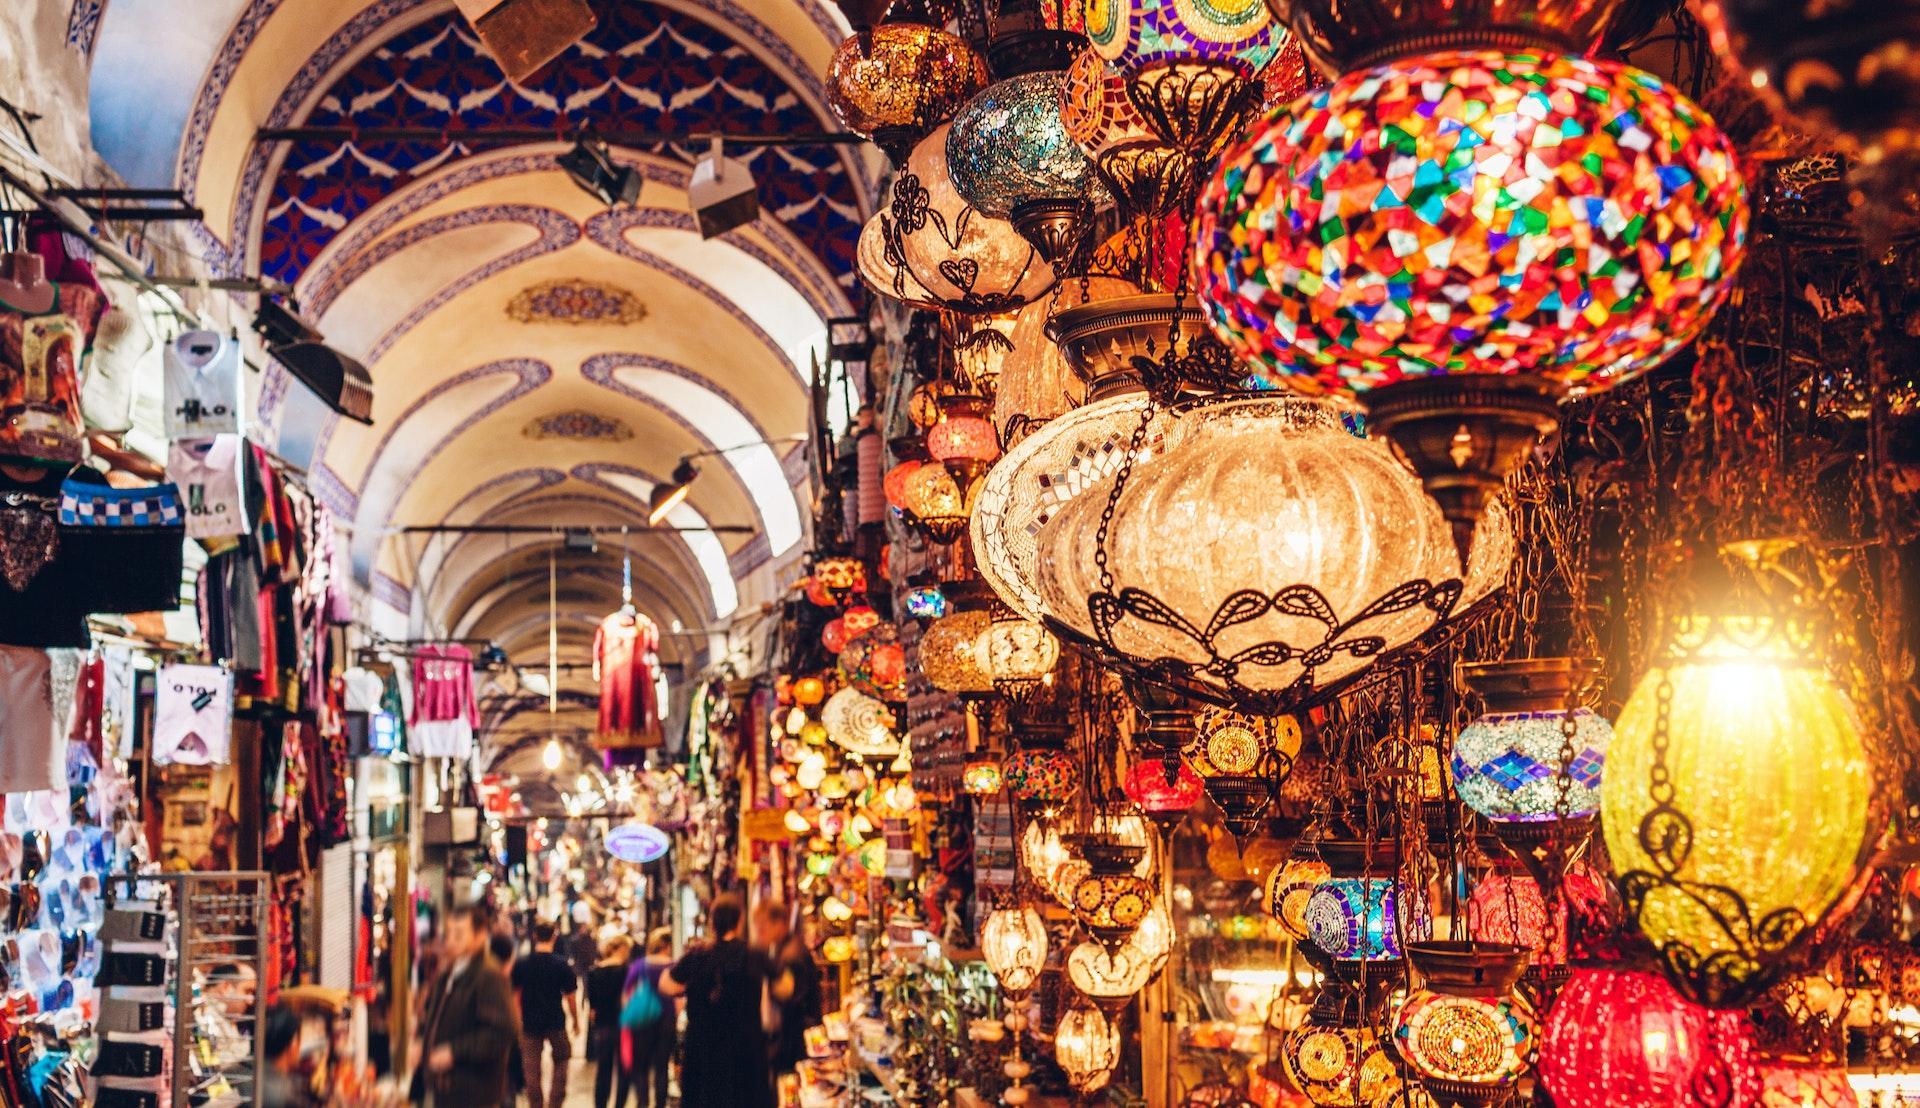 Basar i Midtøsten © Nikada, Getty Images